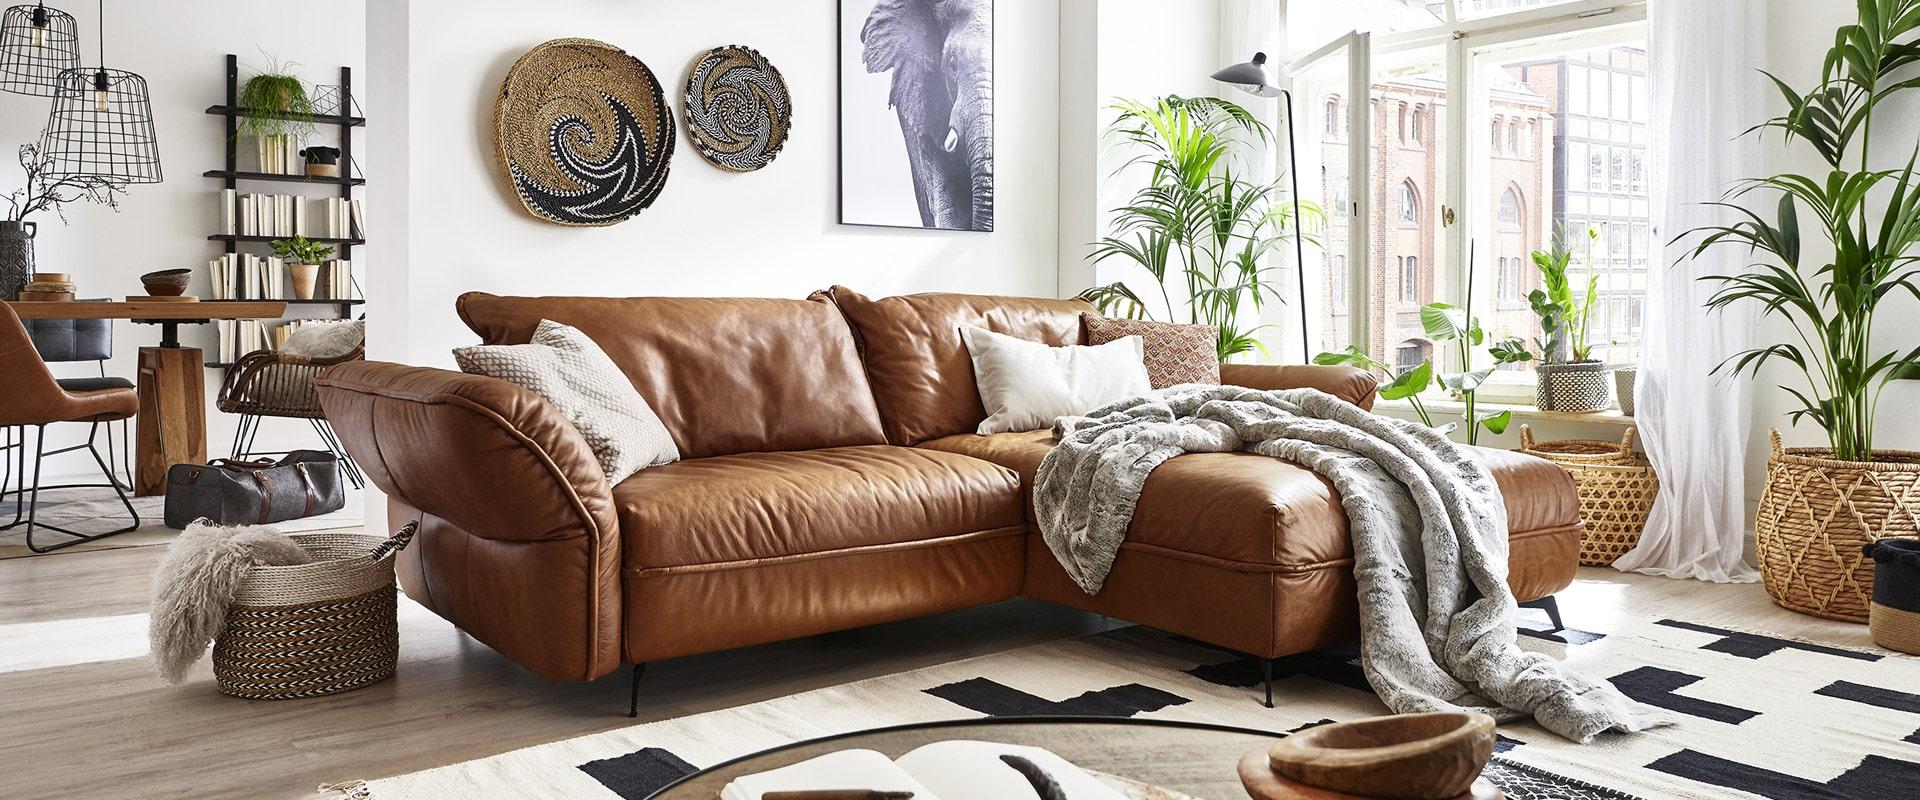 Full Size of Natura Sofa Love Livingston Gebraucht Pasadena Couch Newport Kaufen Brooklyn Kansas Denver Kitzmann Home Company Mbel Und Wohnideen Aus Osnabrck Xxxl Sofa Natura Sofa